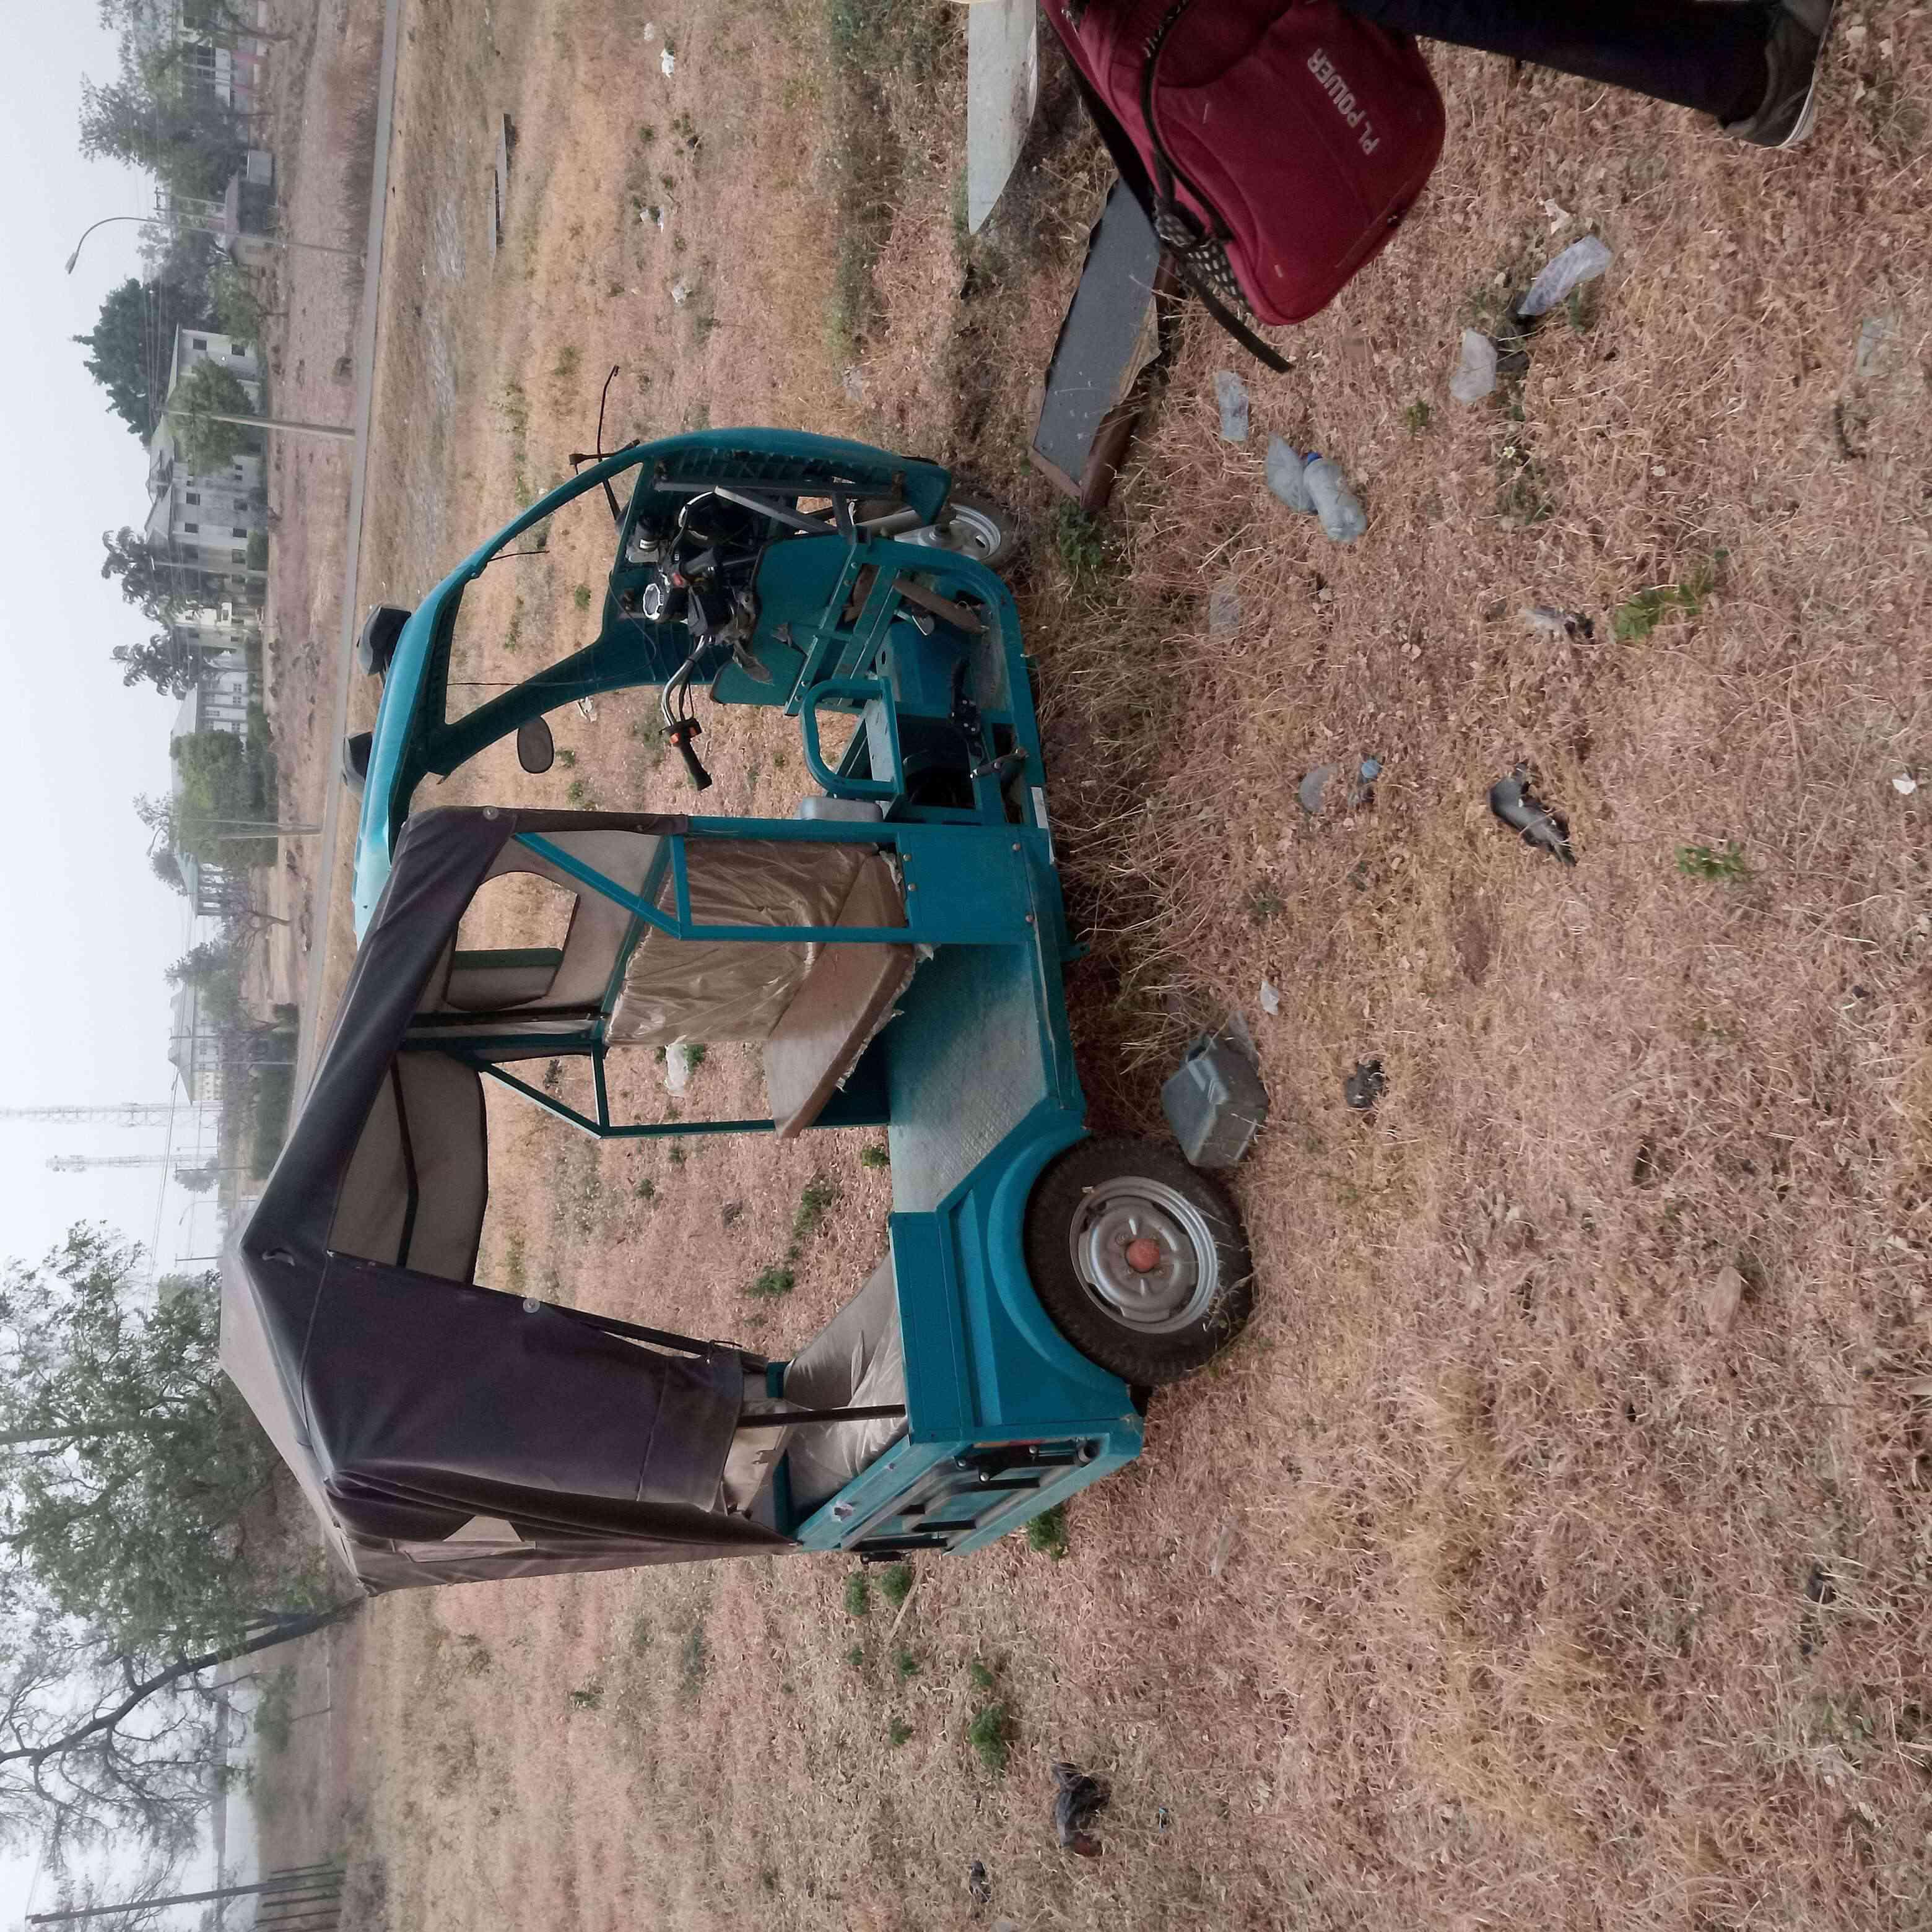 Accident Occurs In Uniabuja Leaving Several Injured, Victims Quarrel